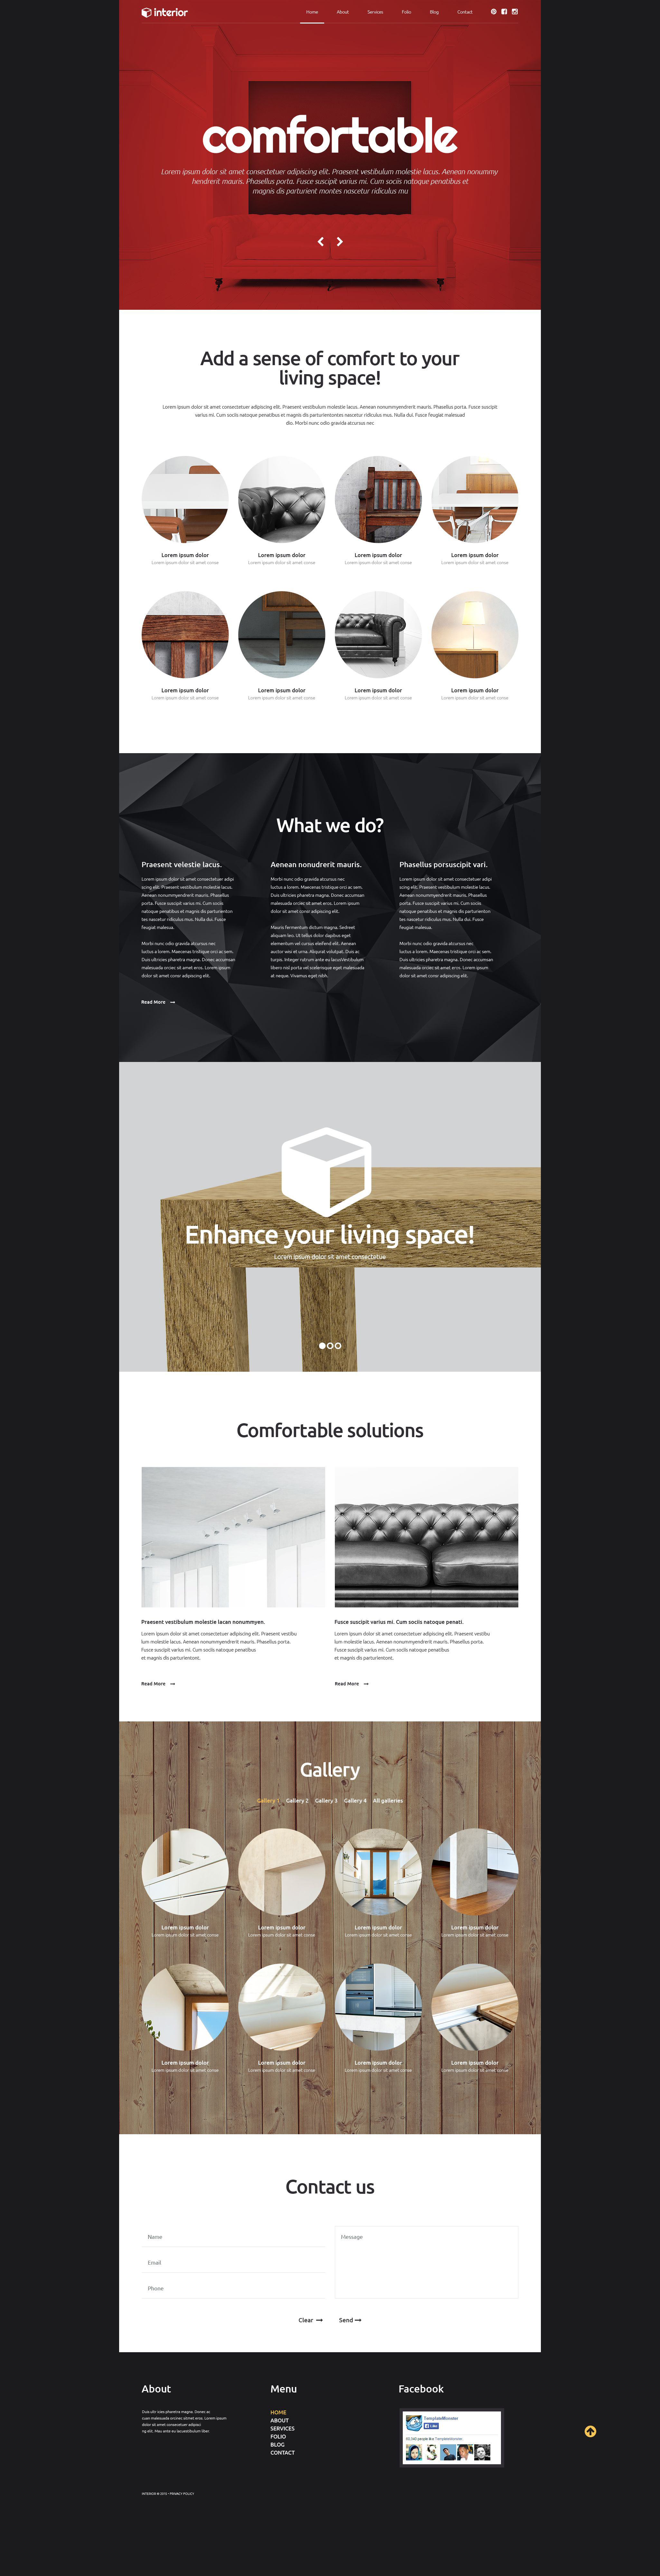 Decor and Furniture WordPress Theme - screenshot